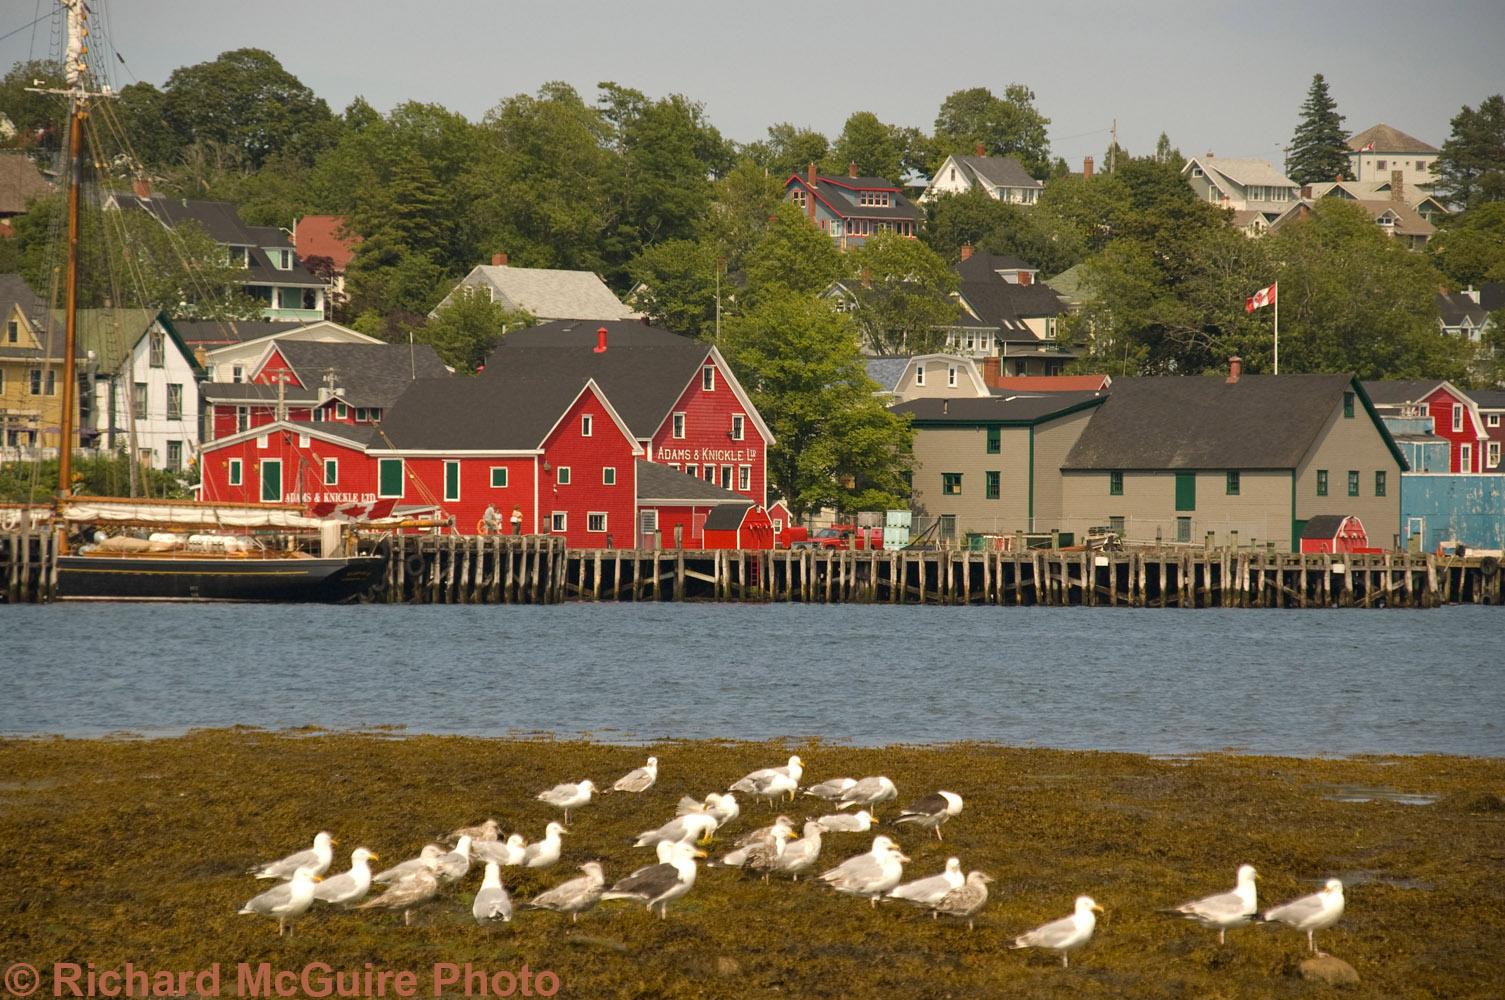 Lunenburg, Nova Scotia, from across the water